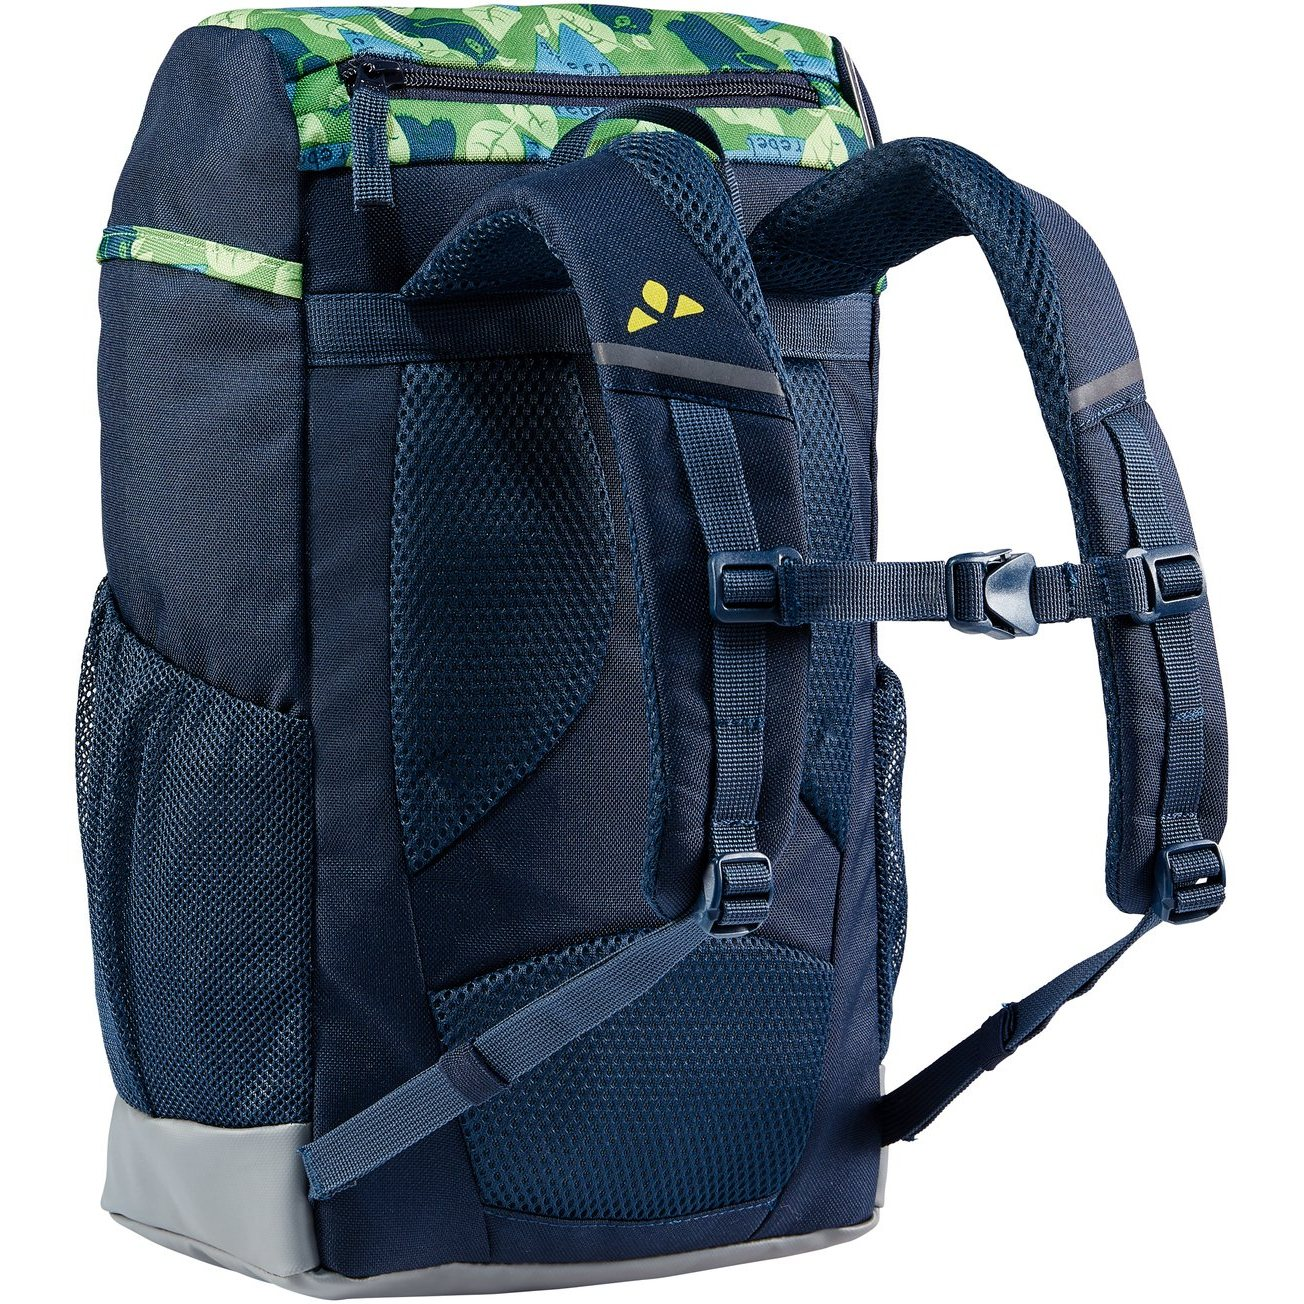 Image of Vaude Puck 10 Kids Backpack - parrot green/eclipse